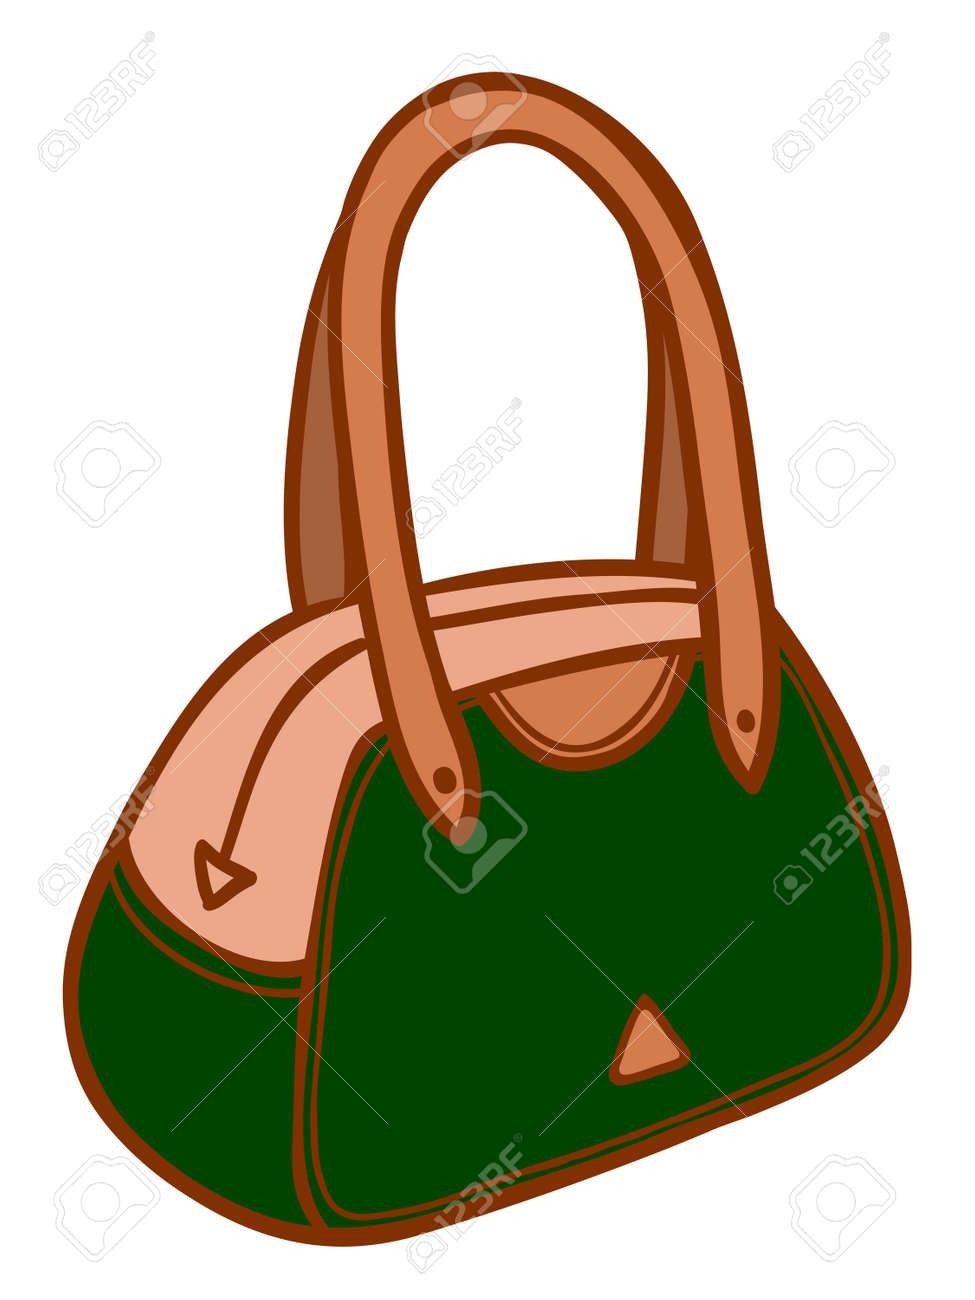 Style Sac Cuir Cartoon Illustration D'un Main Dames En À fgb6yY7